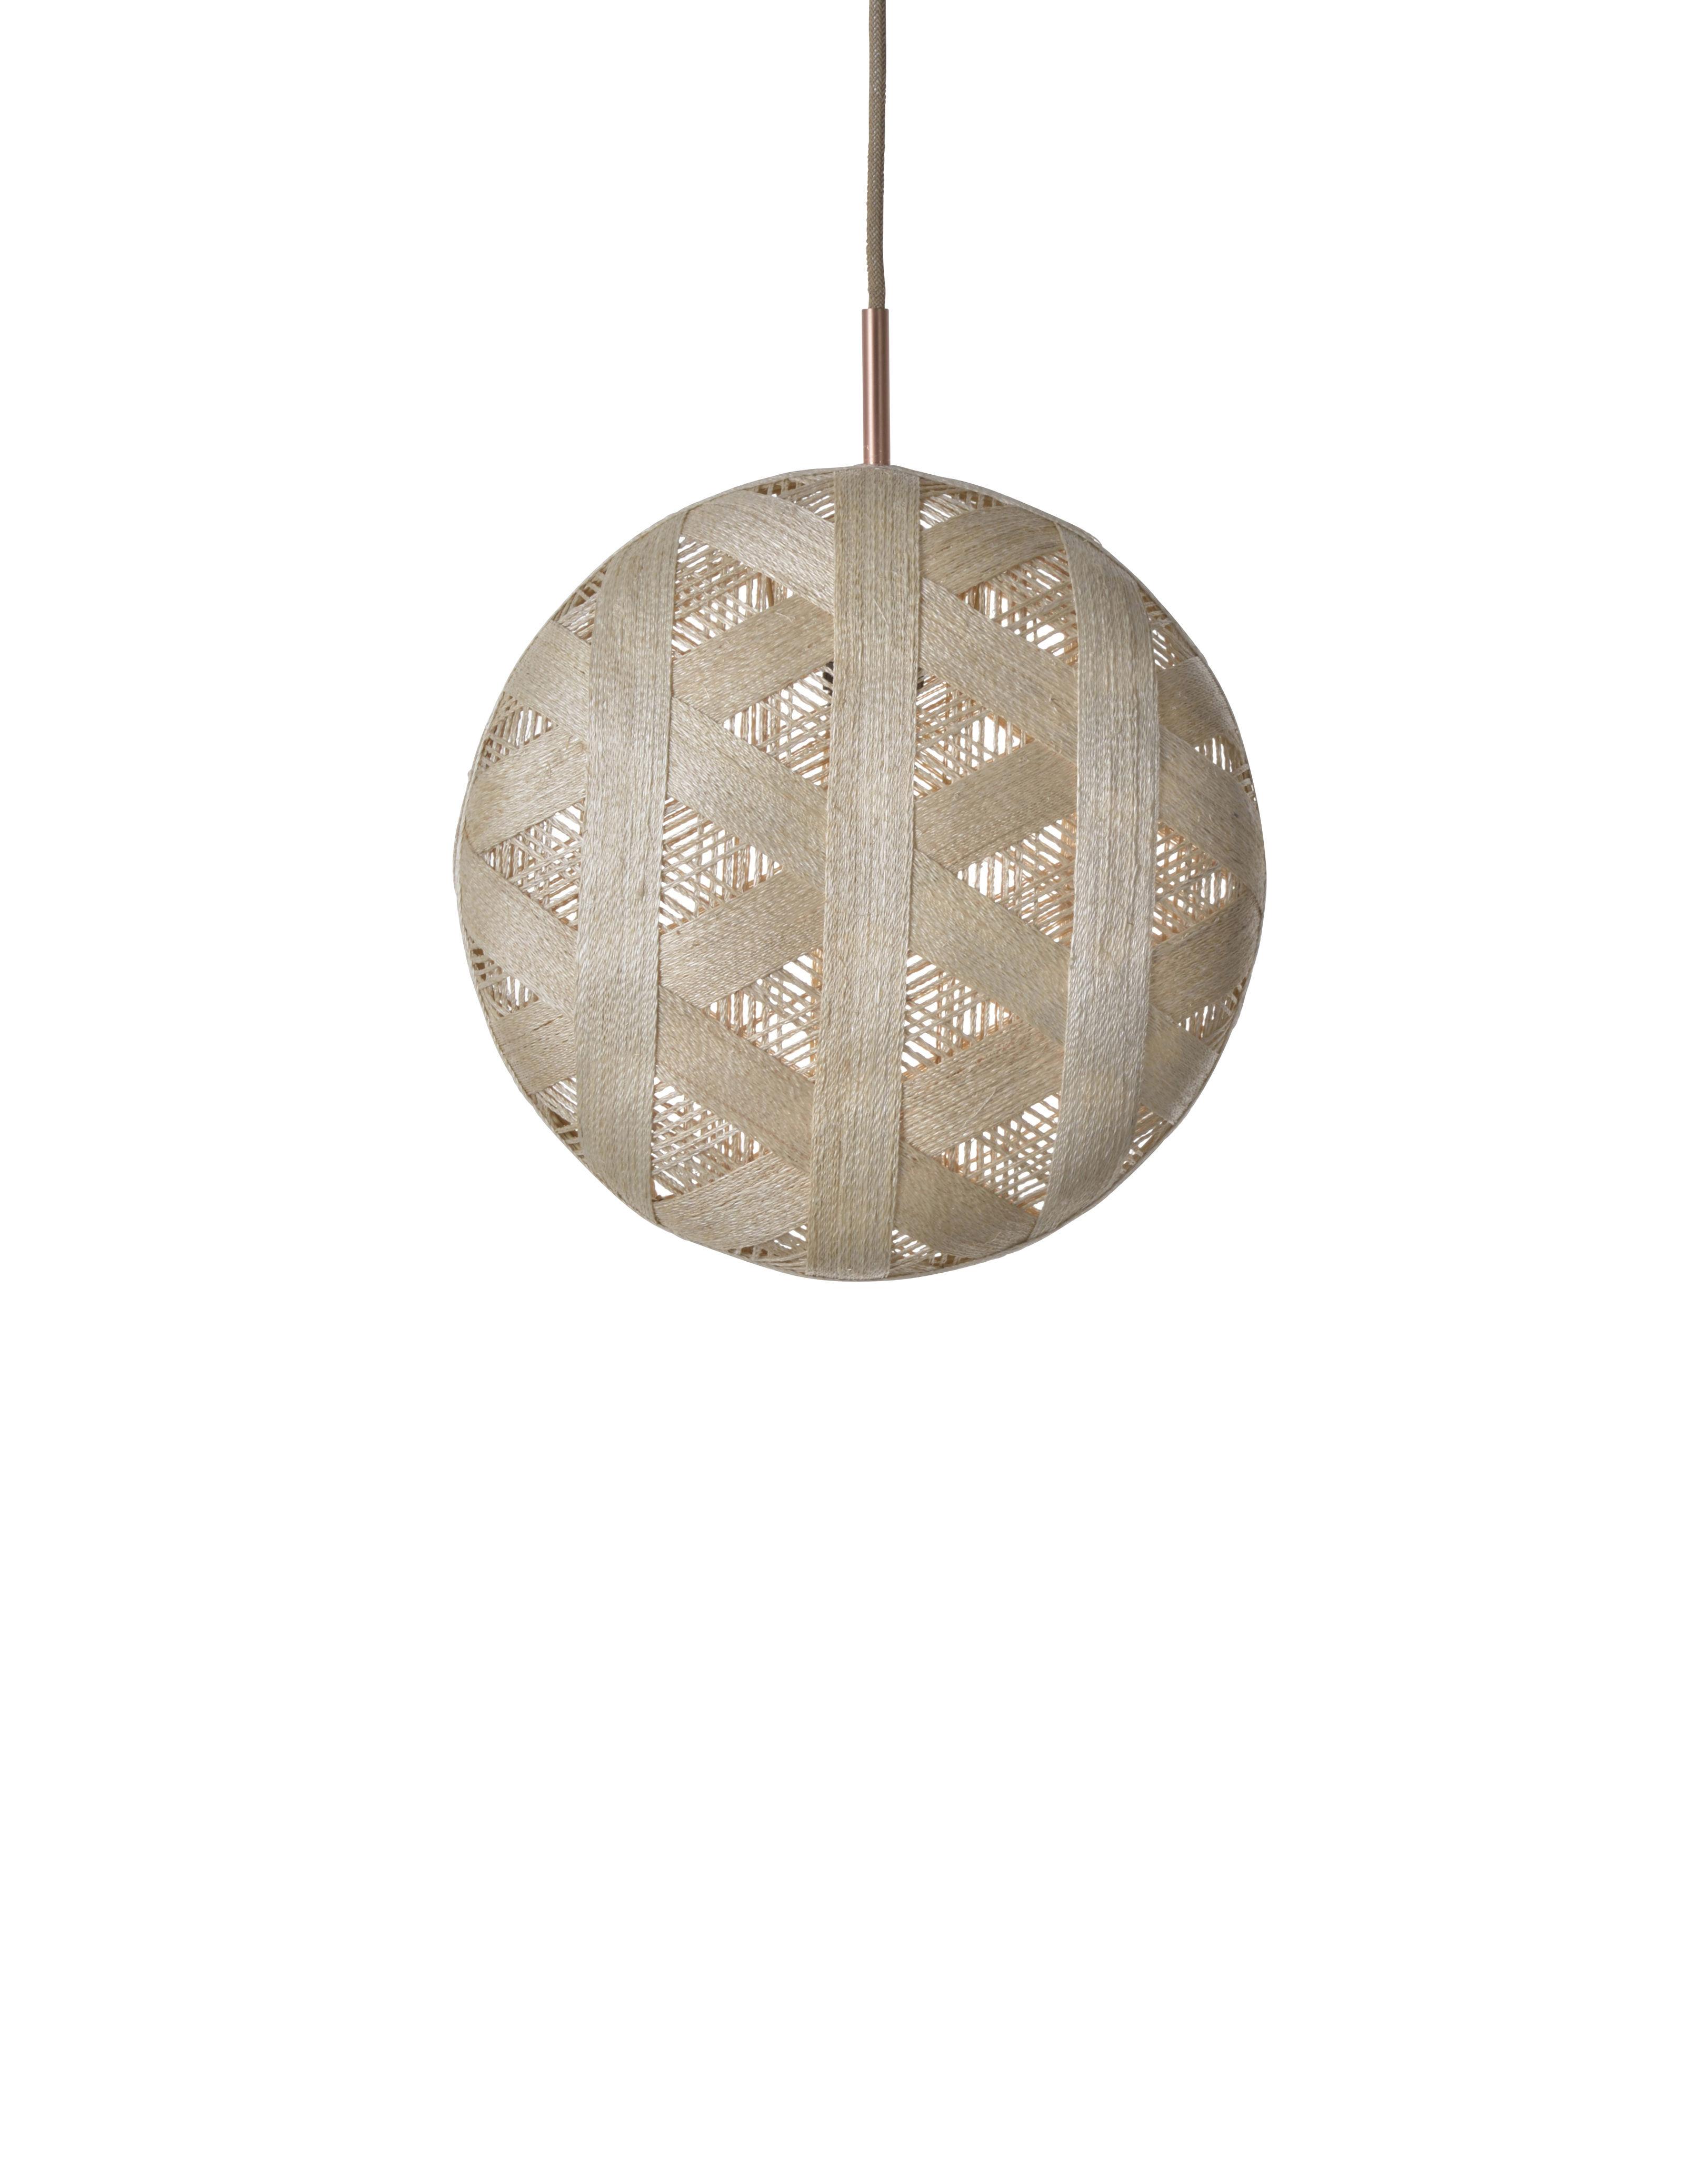 Lighting - Pendant Lighting - Chanpen Hexagon Pendant - Ø  26 cm by Forestier - Natural / Triangle patterns - Woven acaba